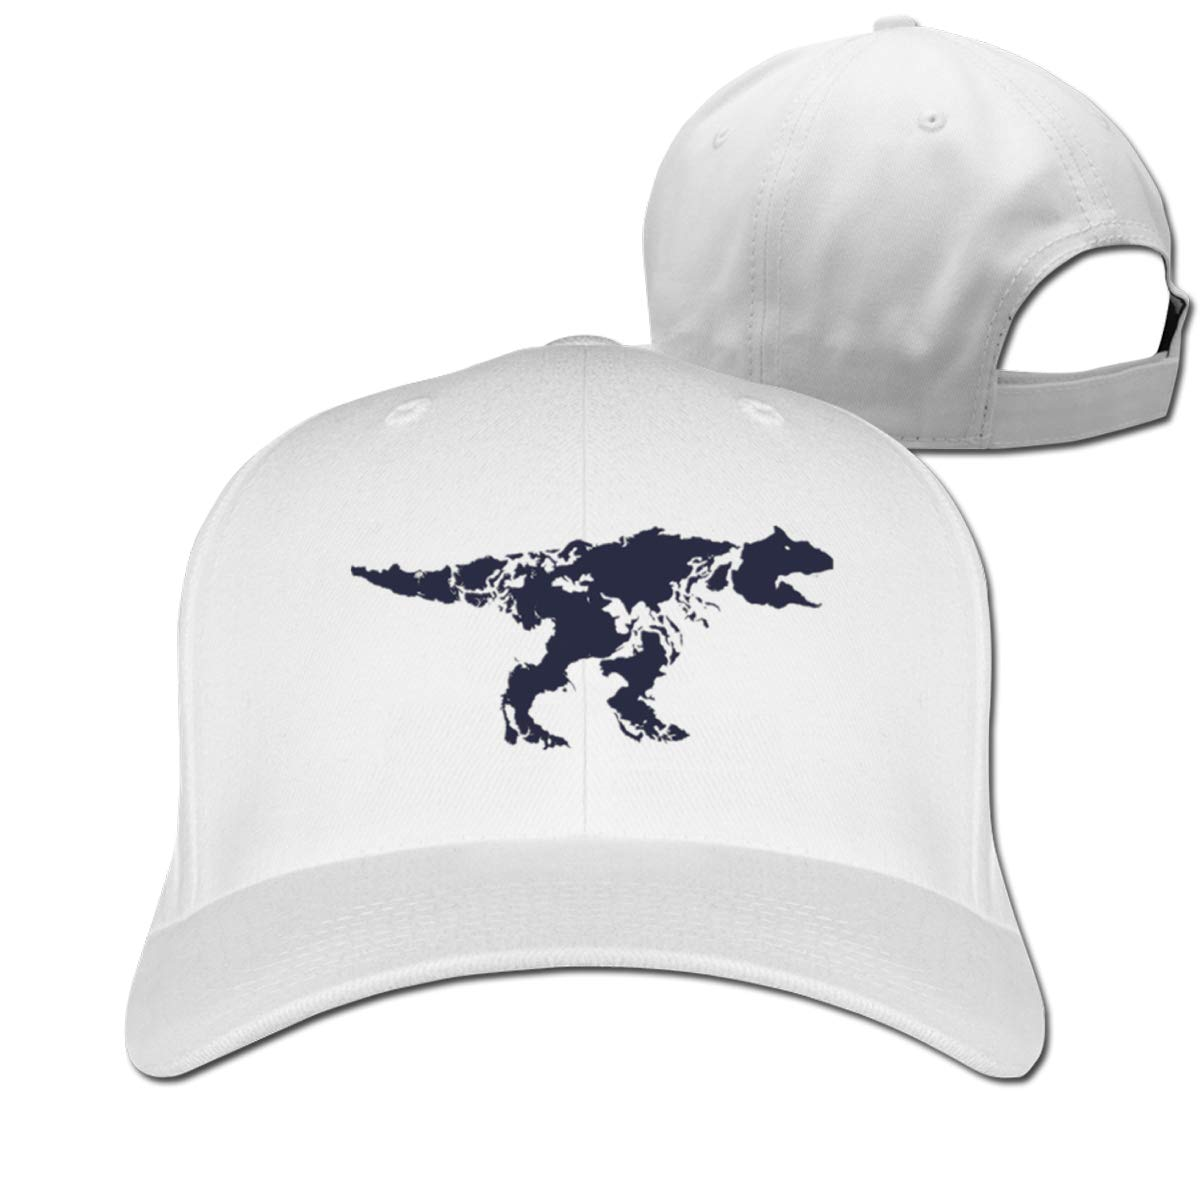 Dinosaur Map Fashion Adjustable Cotton Baseball Caps Trucker Driver Hat Outdoor Cap White